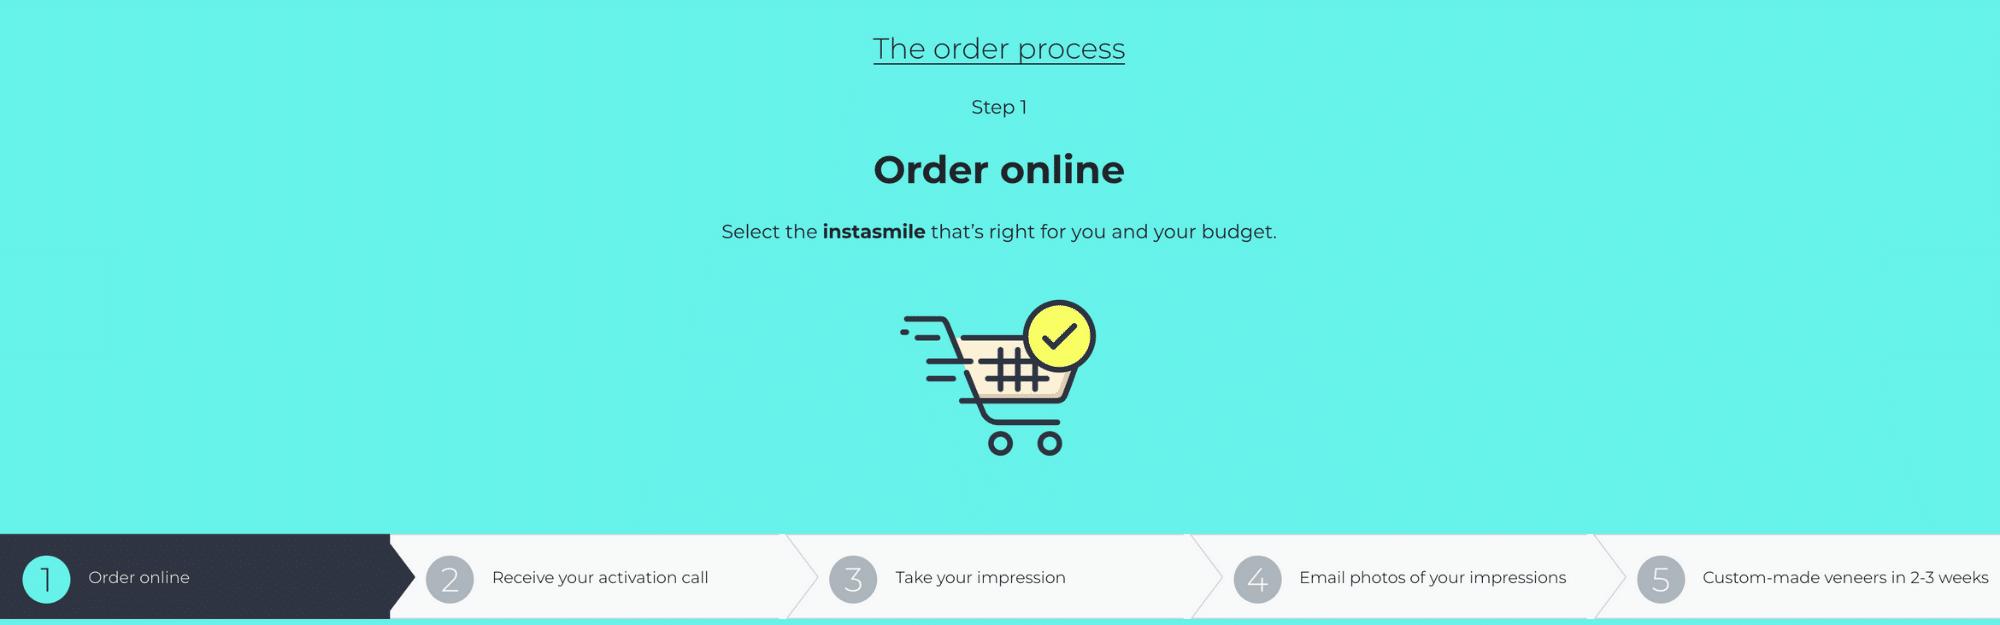 Instasmile Ordering Process